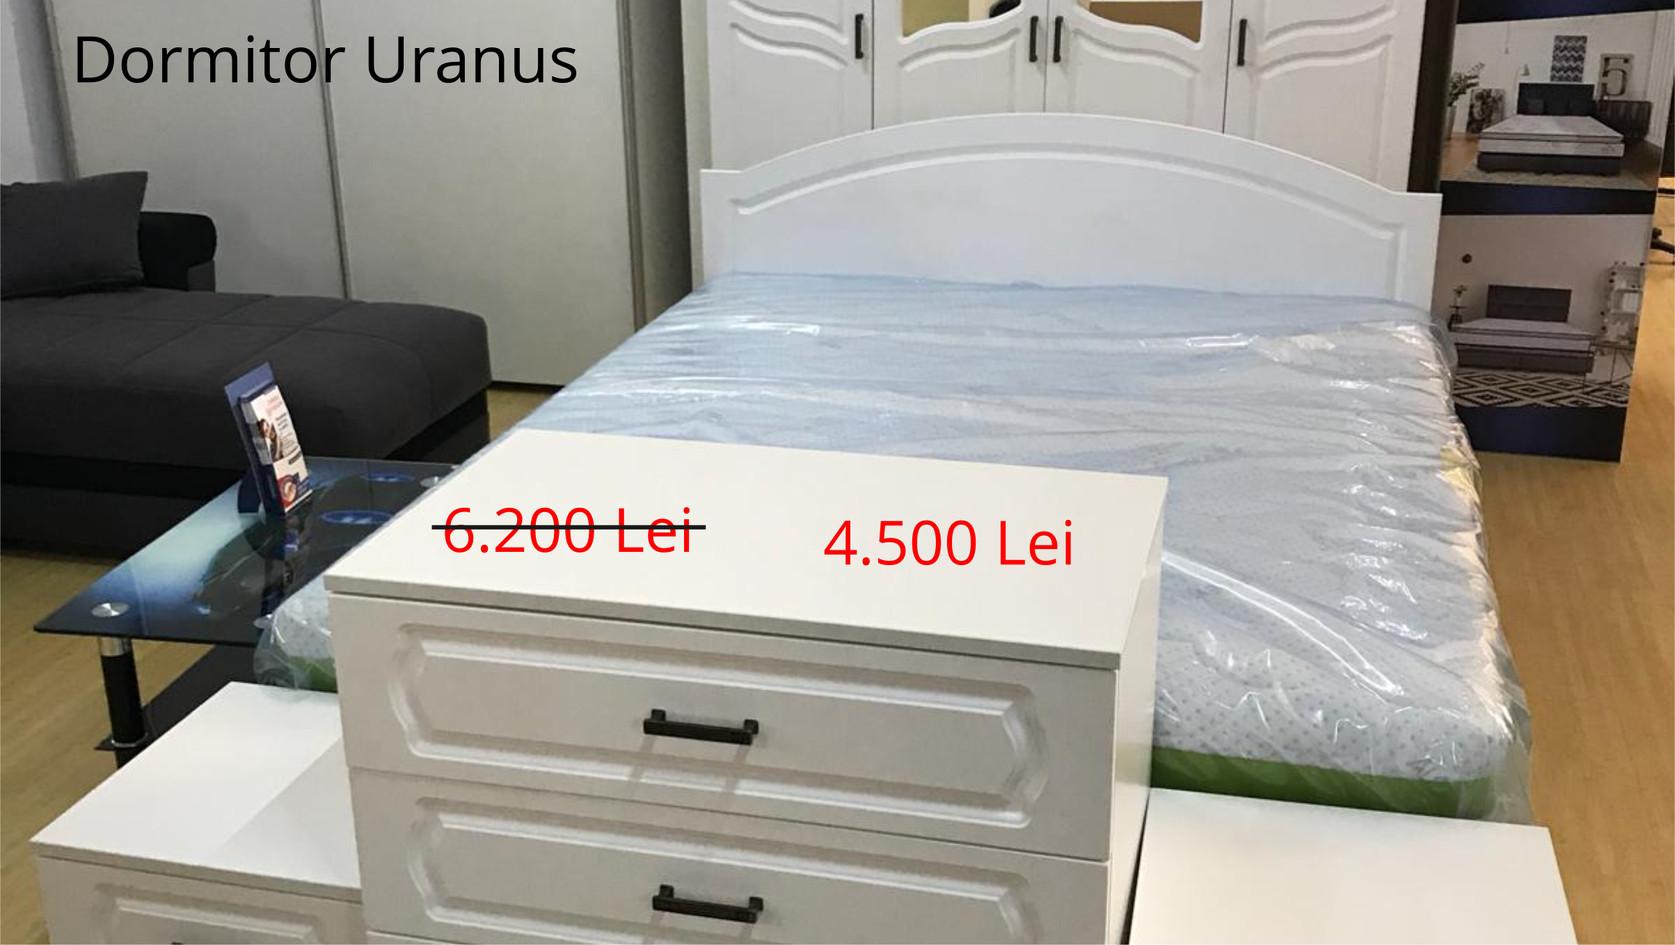 Dormitor Uranus.jpg